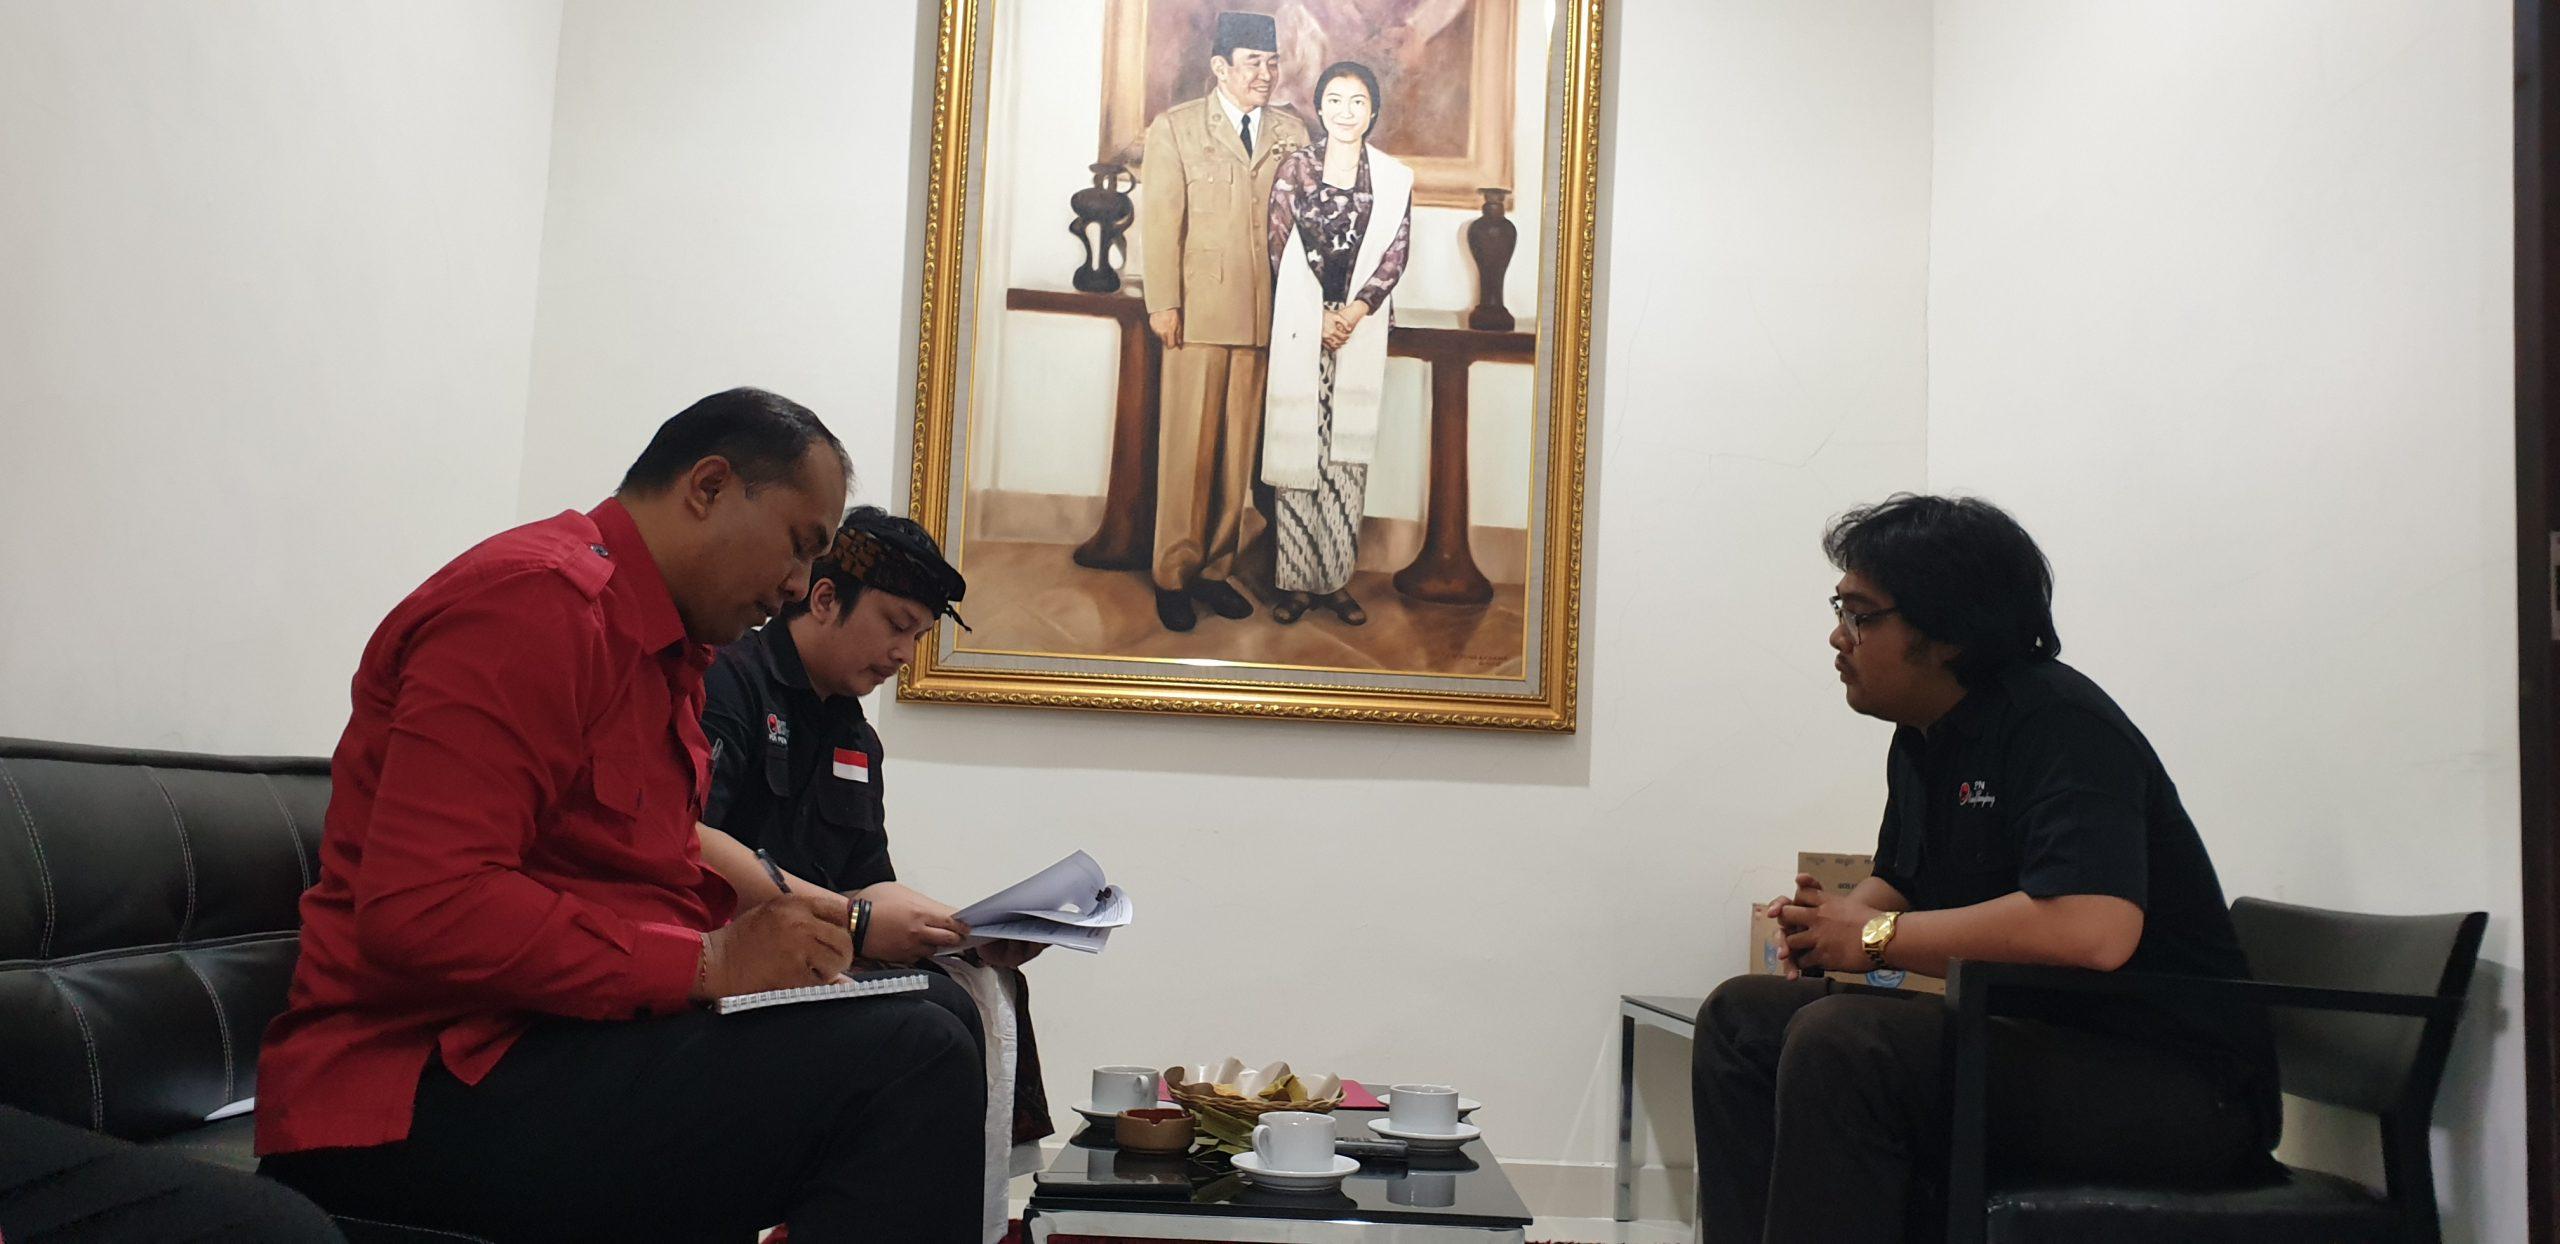 KEPALA BSPN Pusat DPP PDIP, Dimas Dendang (dua kiri), memeriksa berkas salah satu calon kepala BSPN cabang saat tes di DPD PDIP Bali, Selasa (3/3). Foto: gus hendra